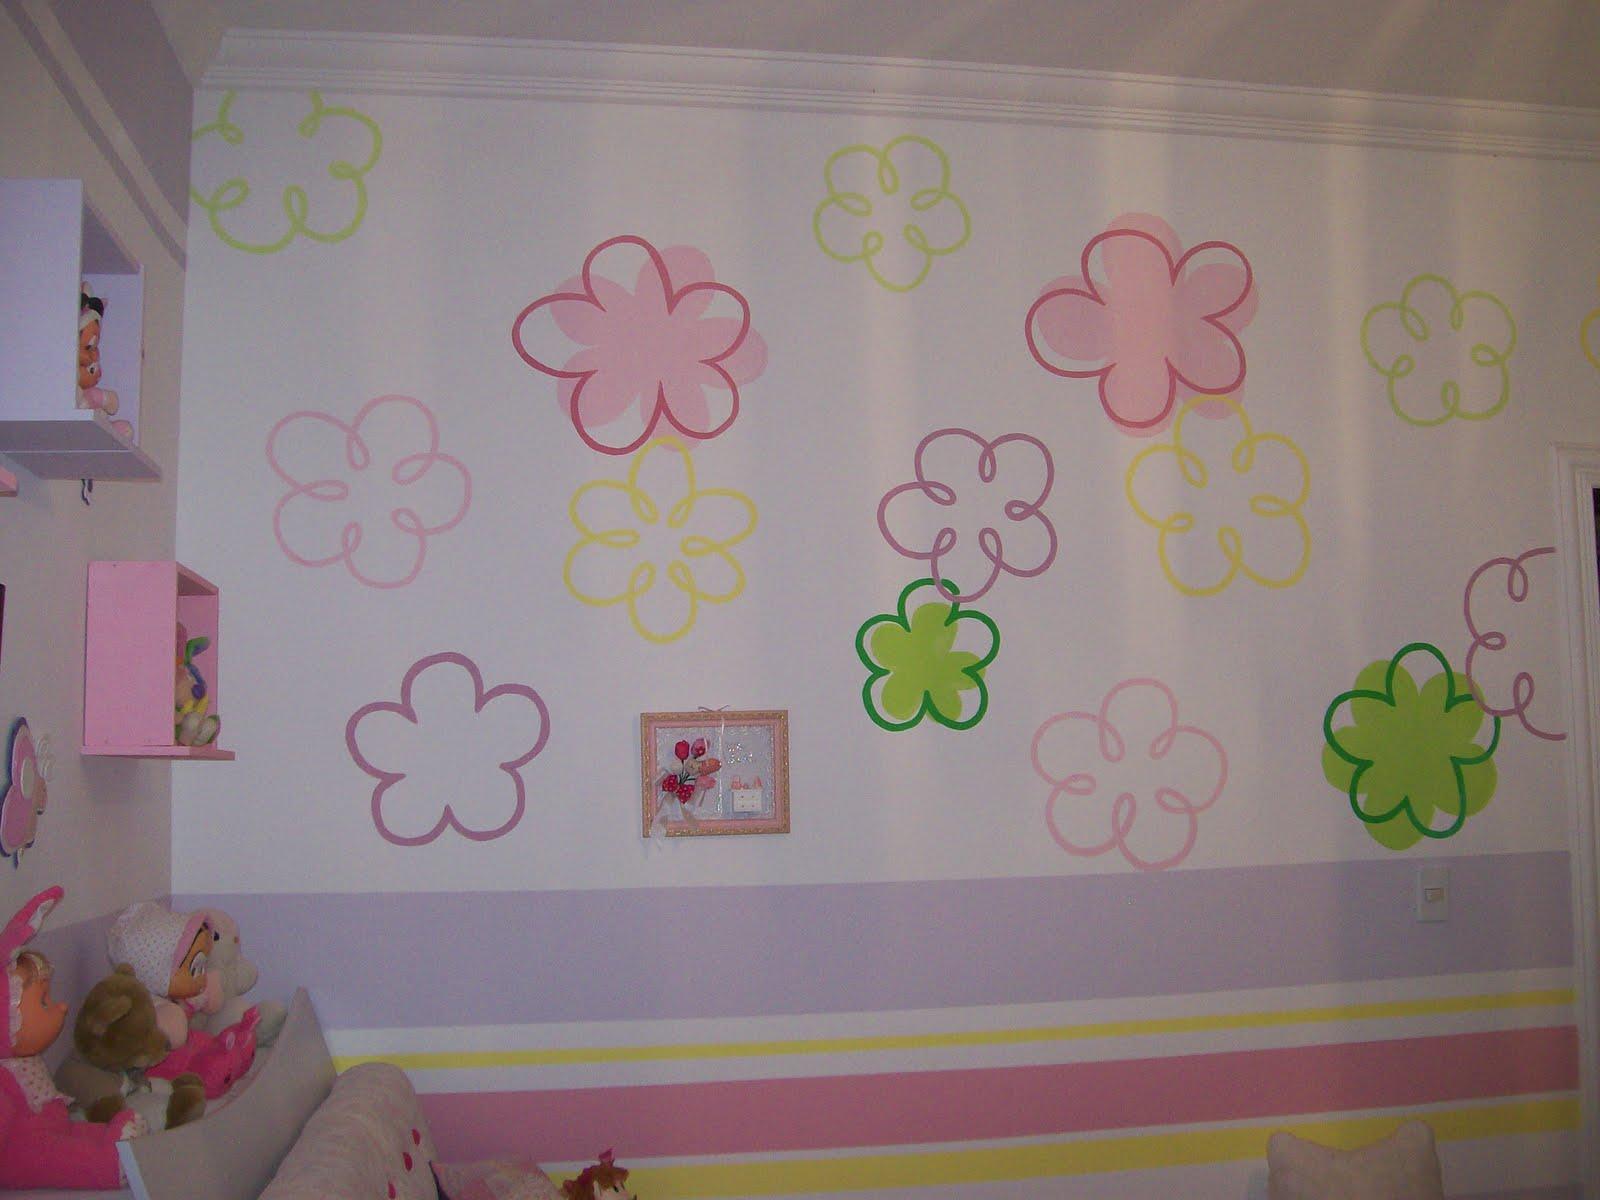 wallpaper pintando meu mundo - photo #32